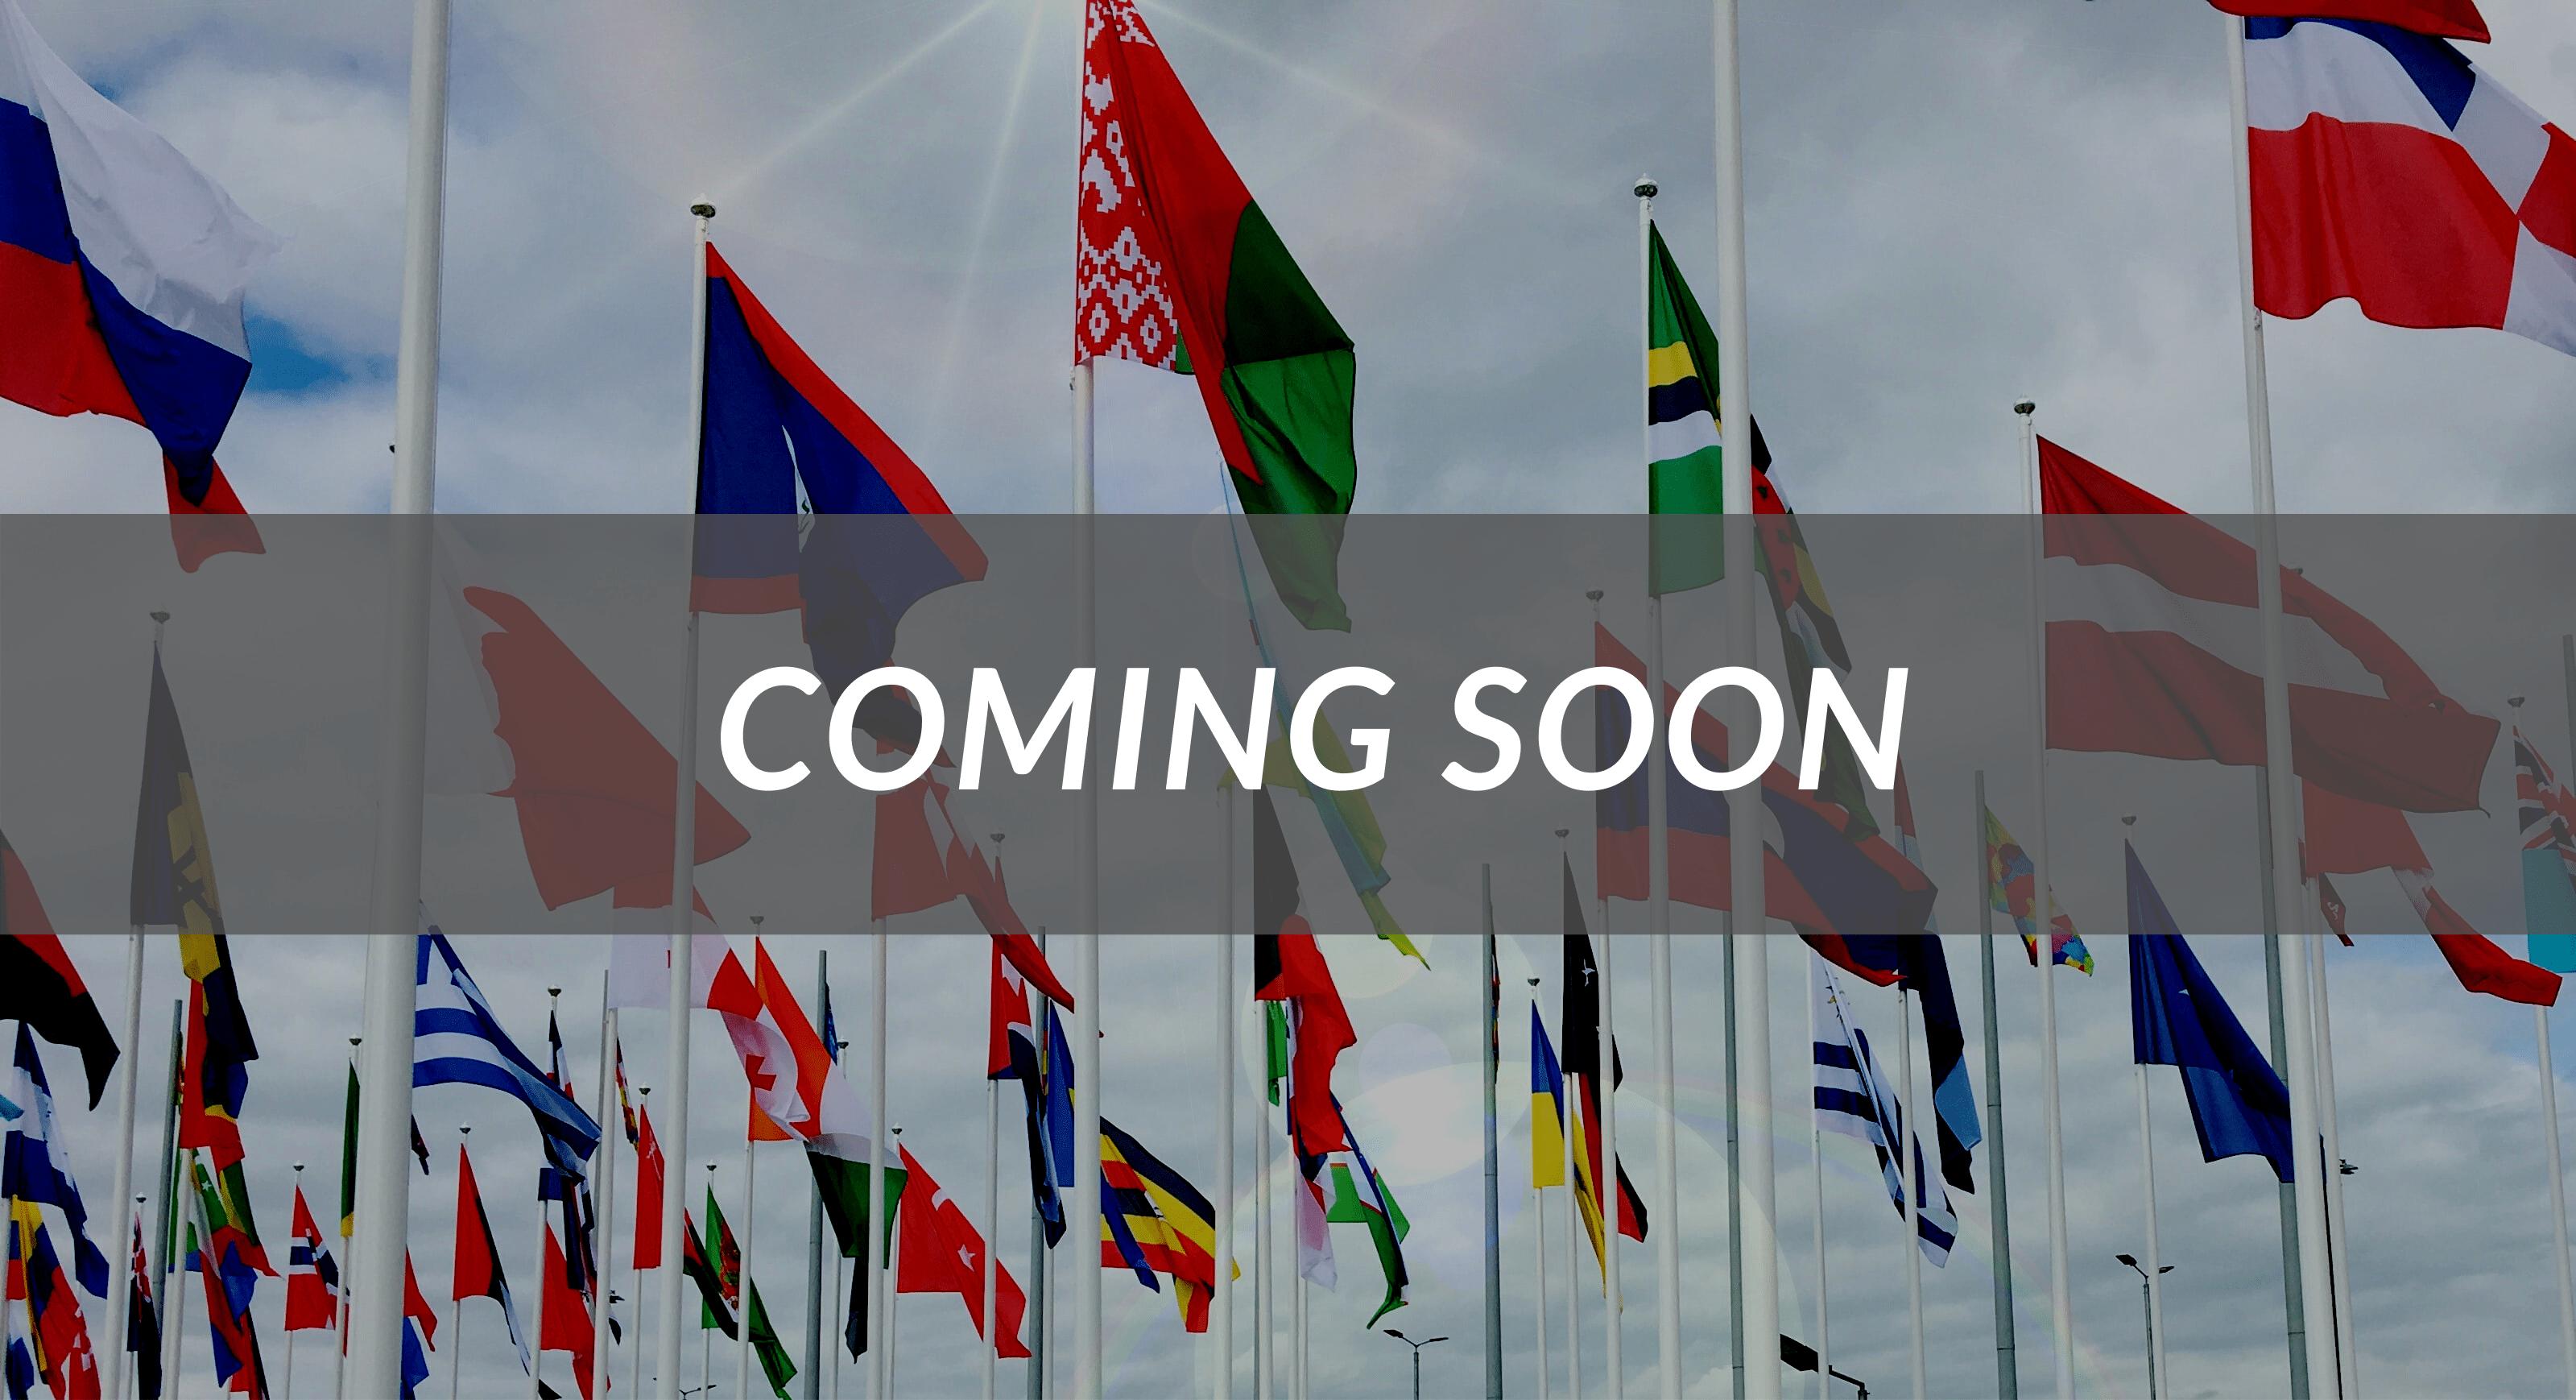 coming soon, worldwide courses